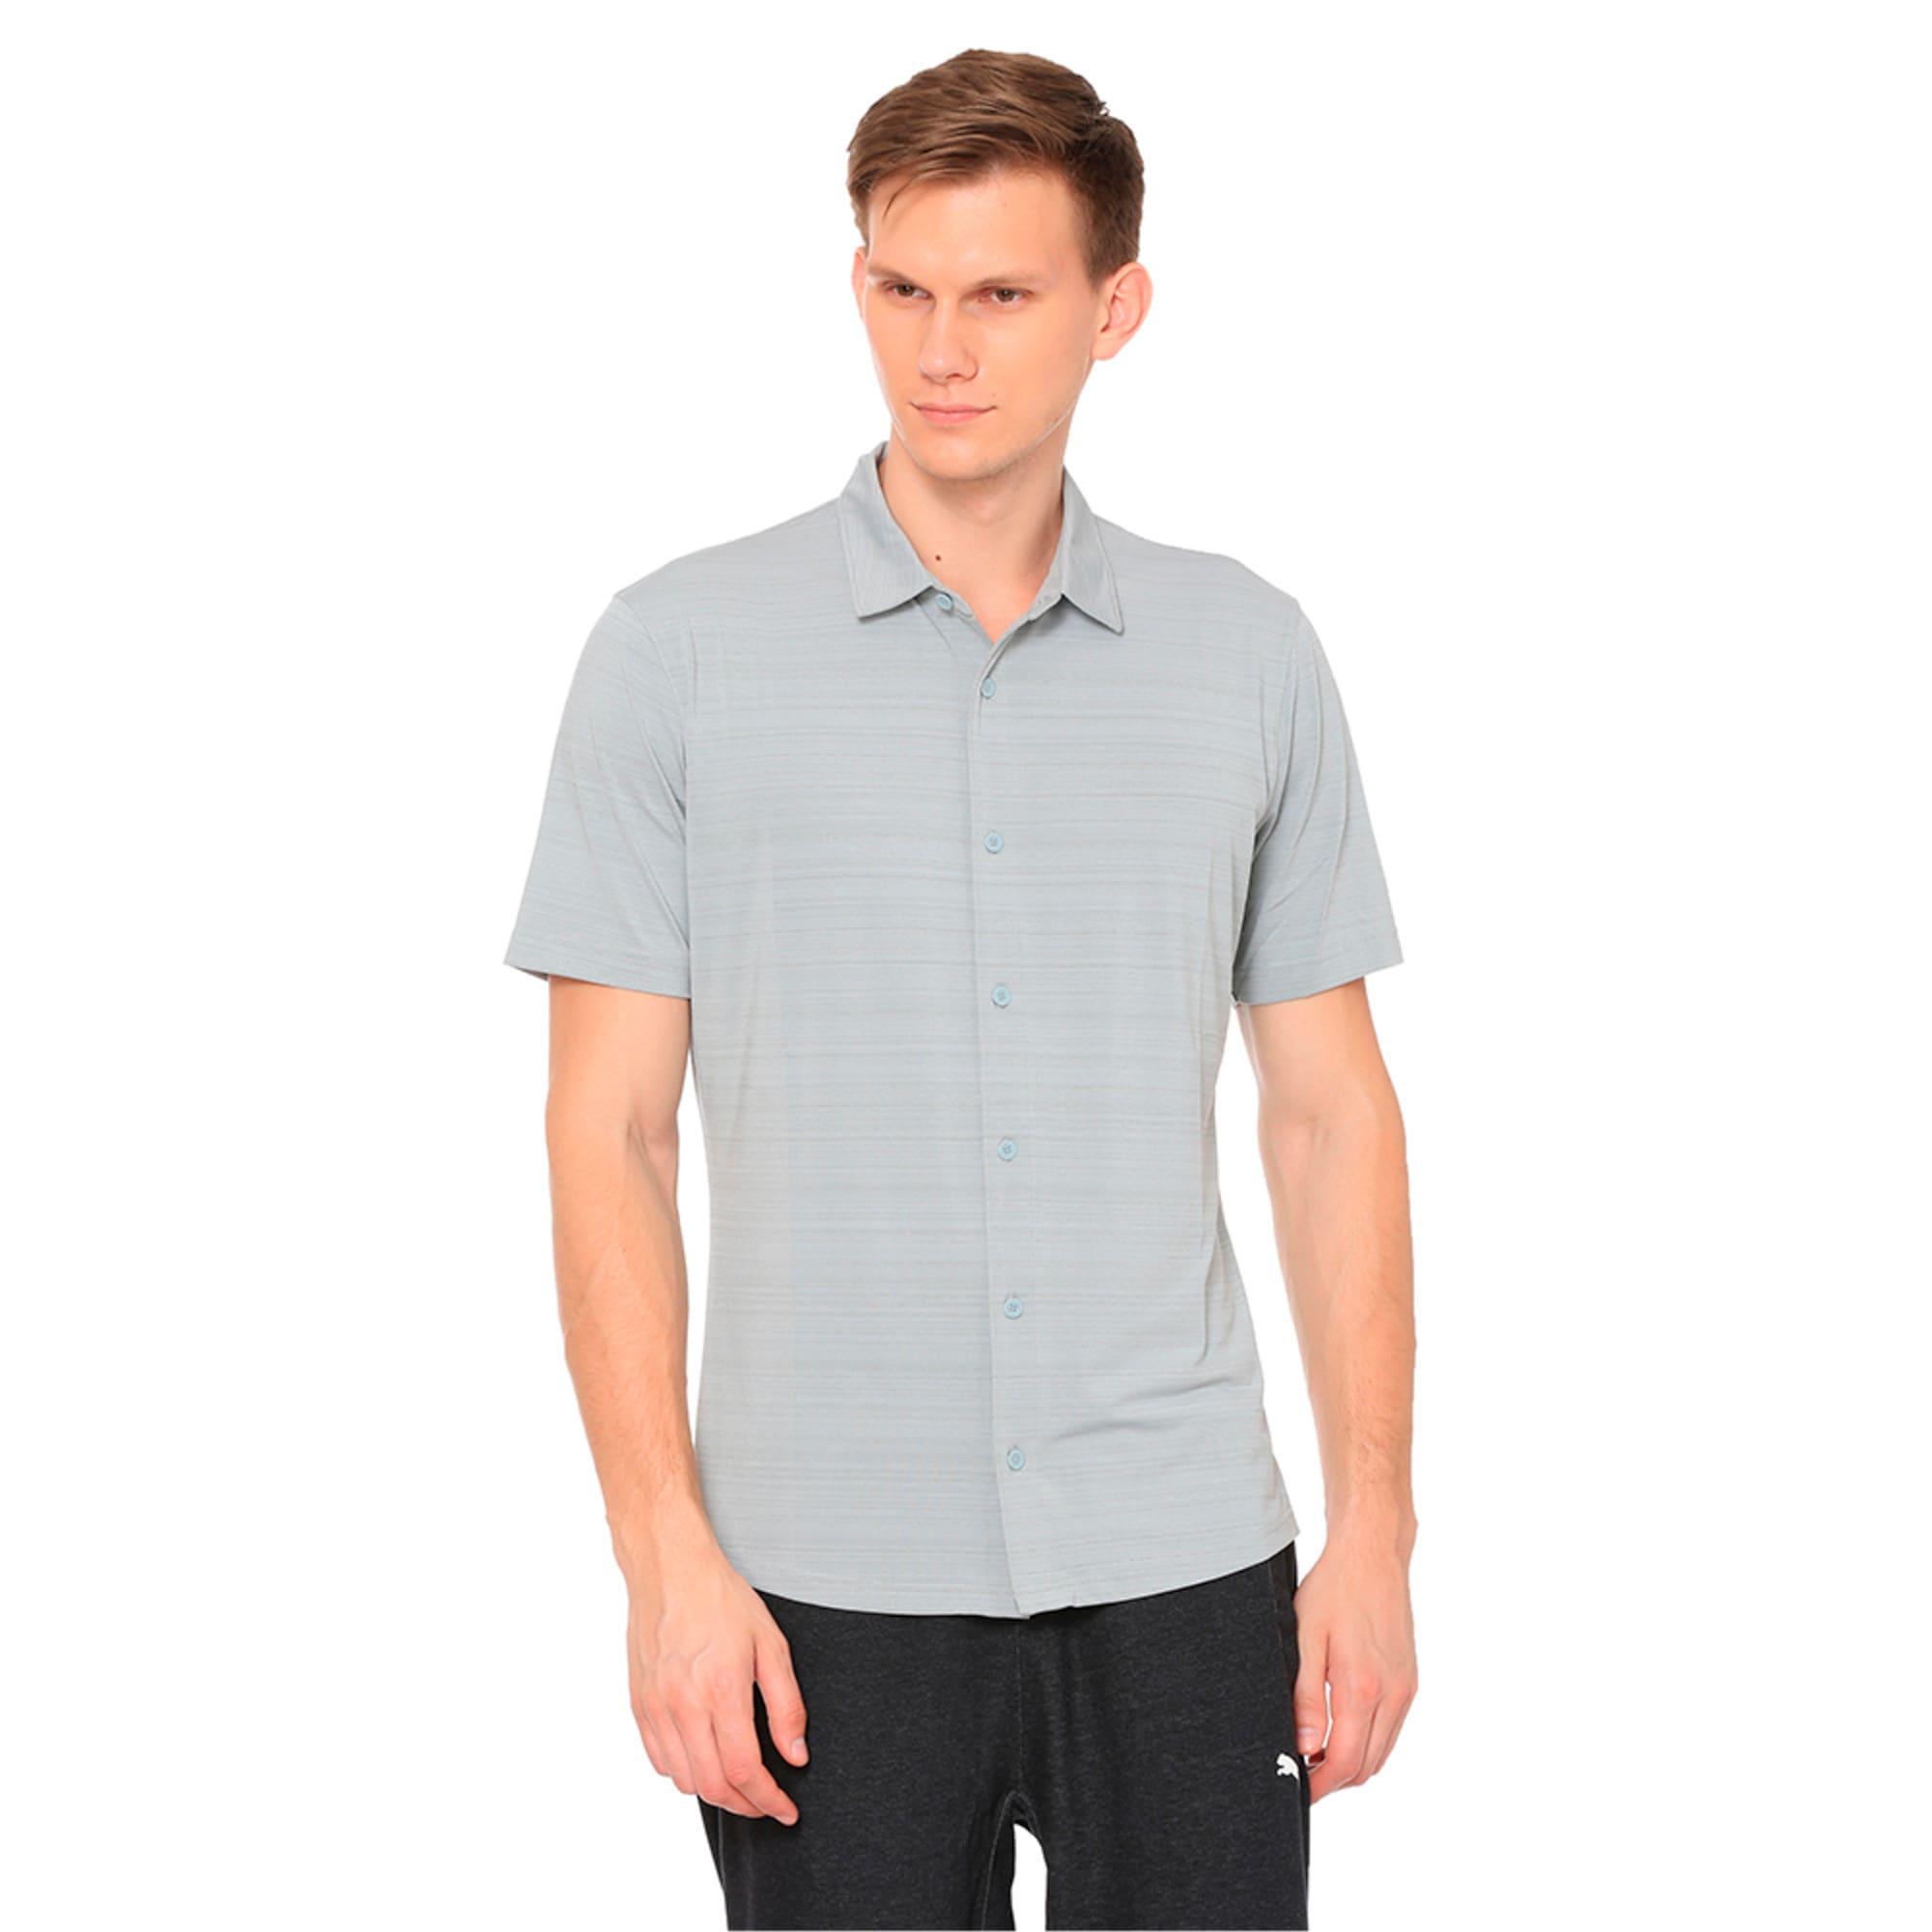 Thumbnail 1 of Breezer Short Sleeve Men's Golf Shirt, Quarry, medium-IND